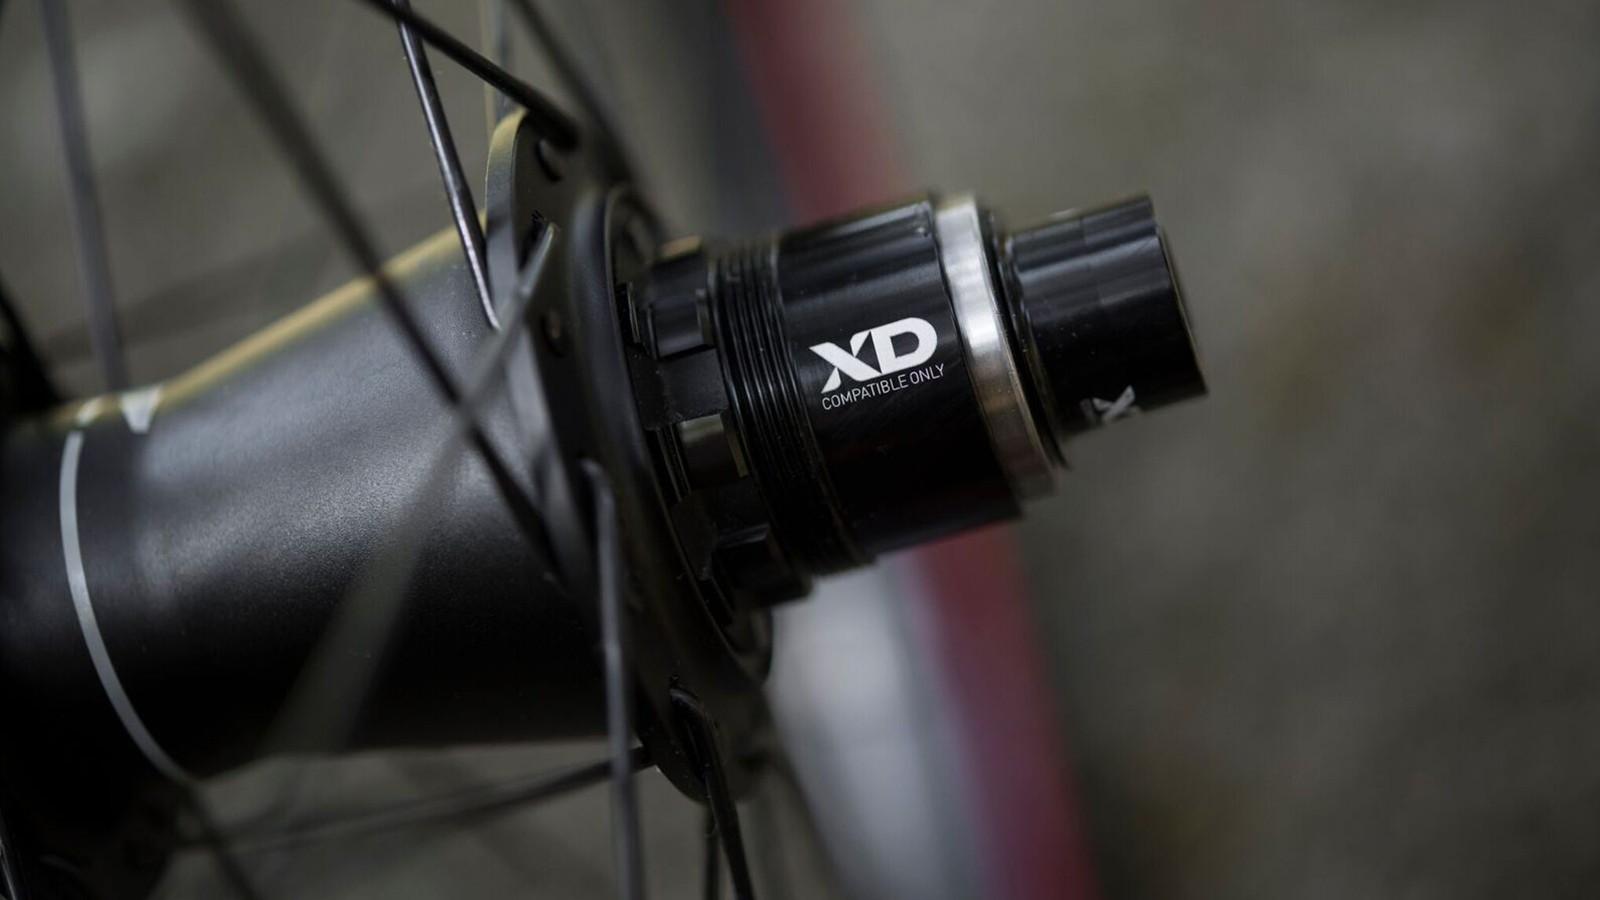 The wheels use 32 J-bend spokes on Zipp ZM1 hubs